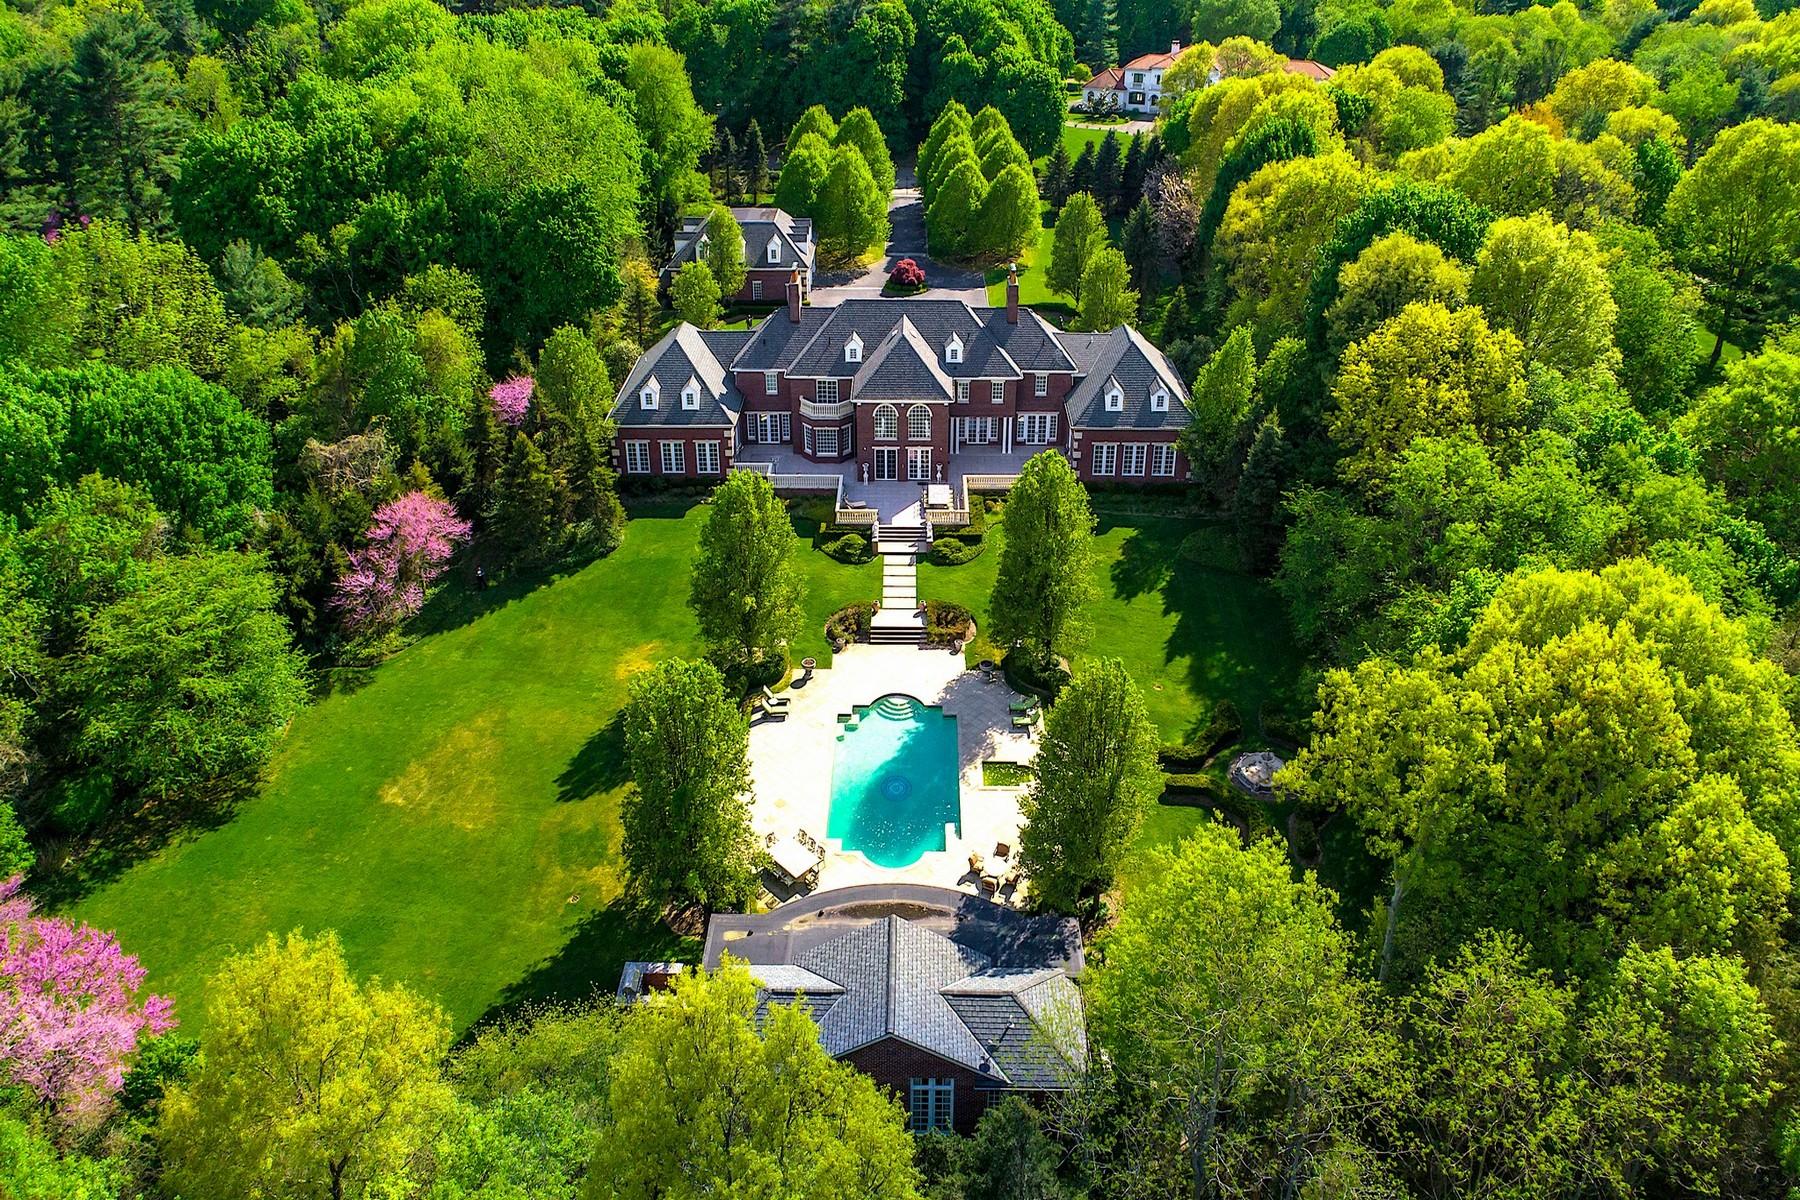 Single Family Homes for Sale at Upper Brookville 1 Bel Air Ct Upper Brookville, New York 11771 United States